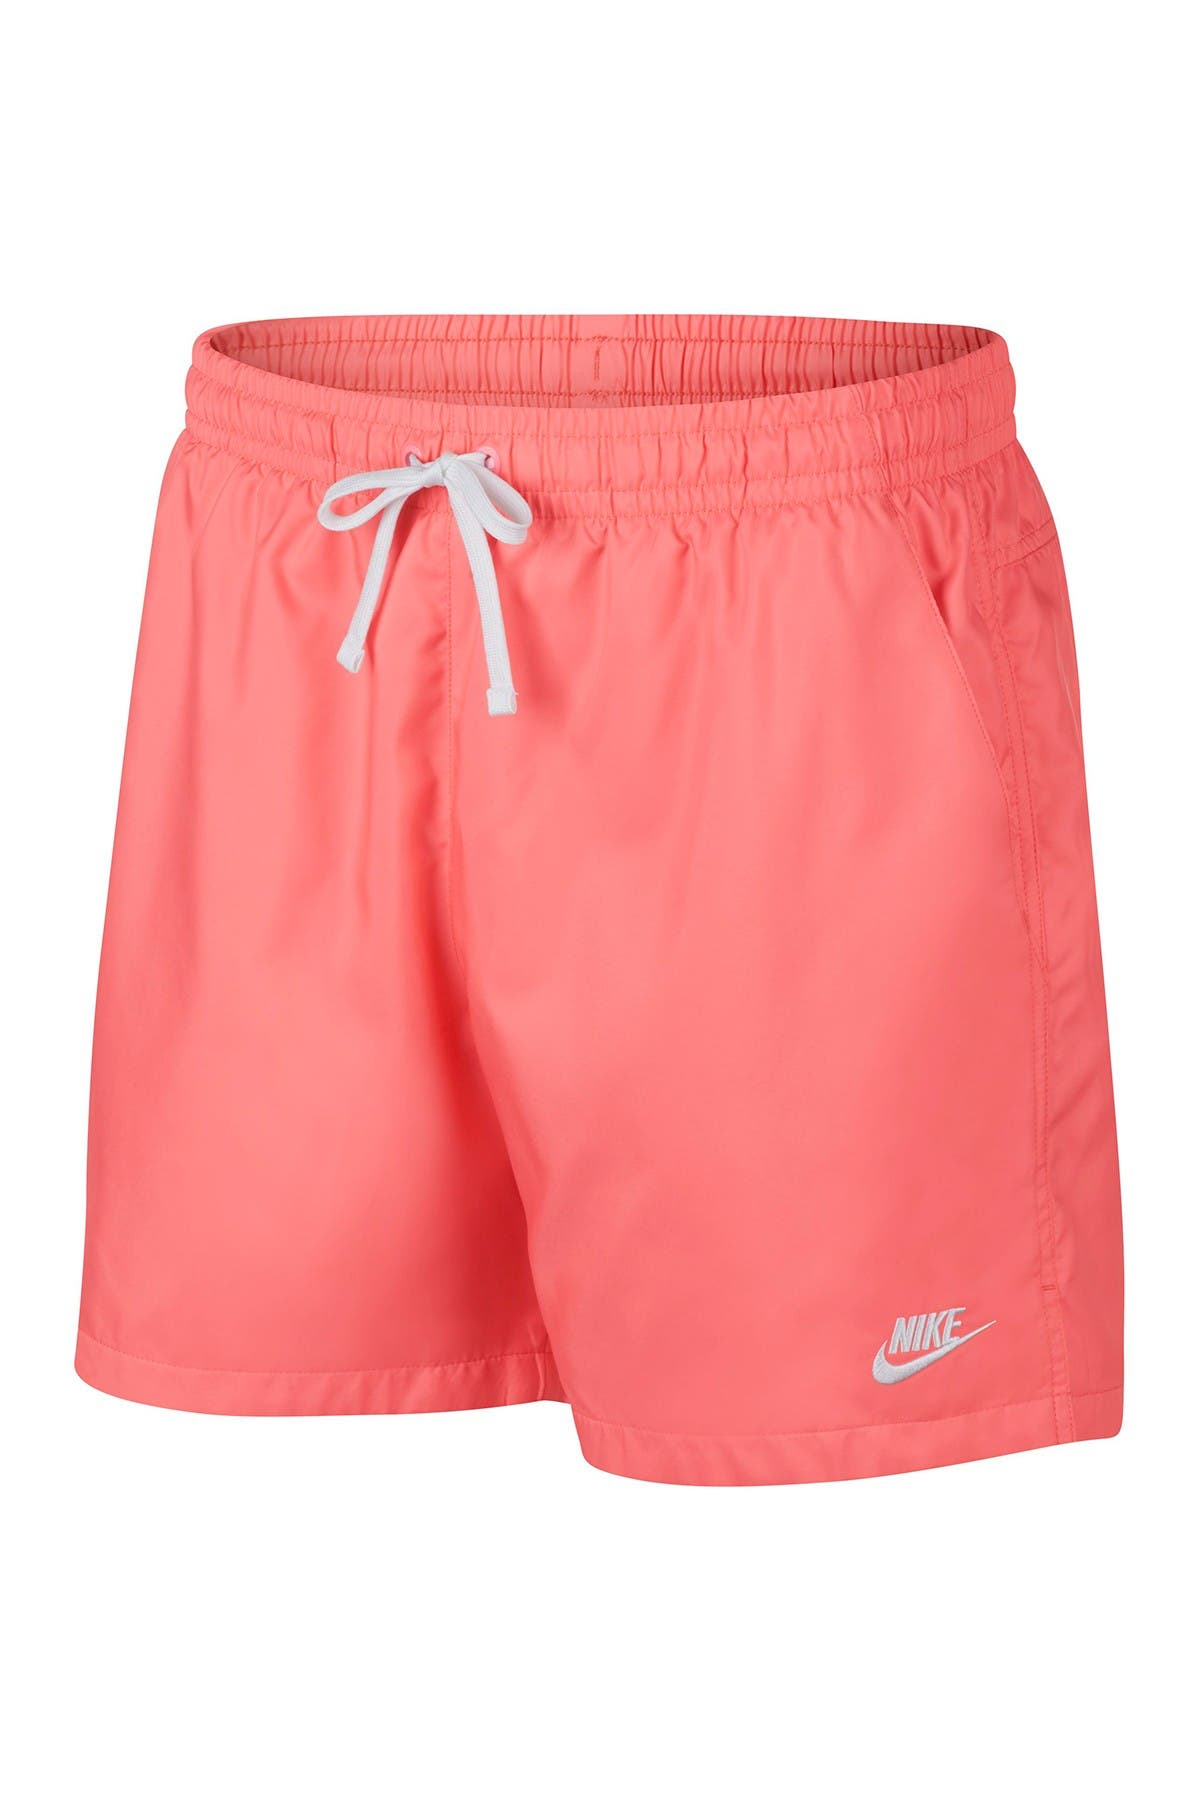 Nike   Flow Woven Shorts   Nordstrom Rack